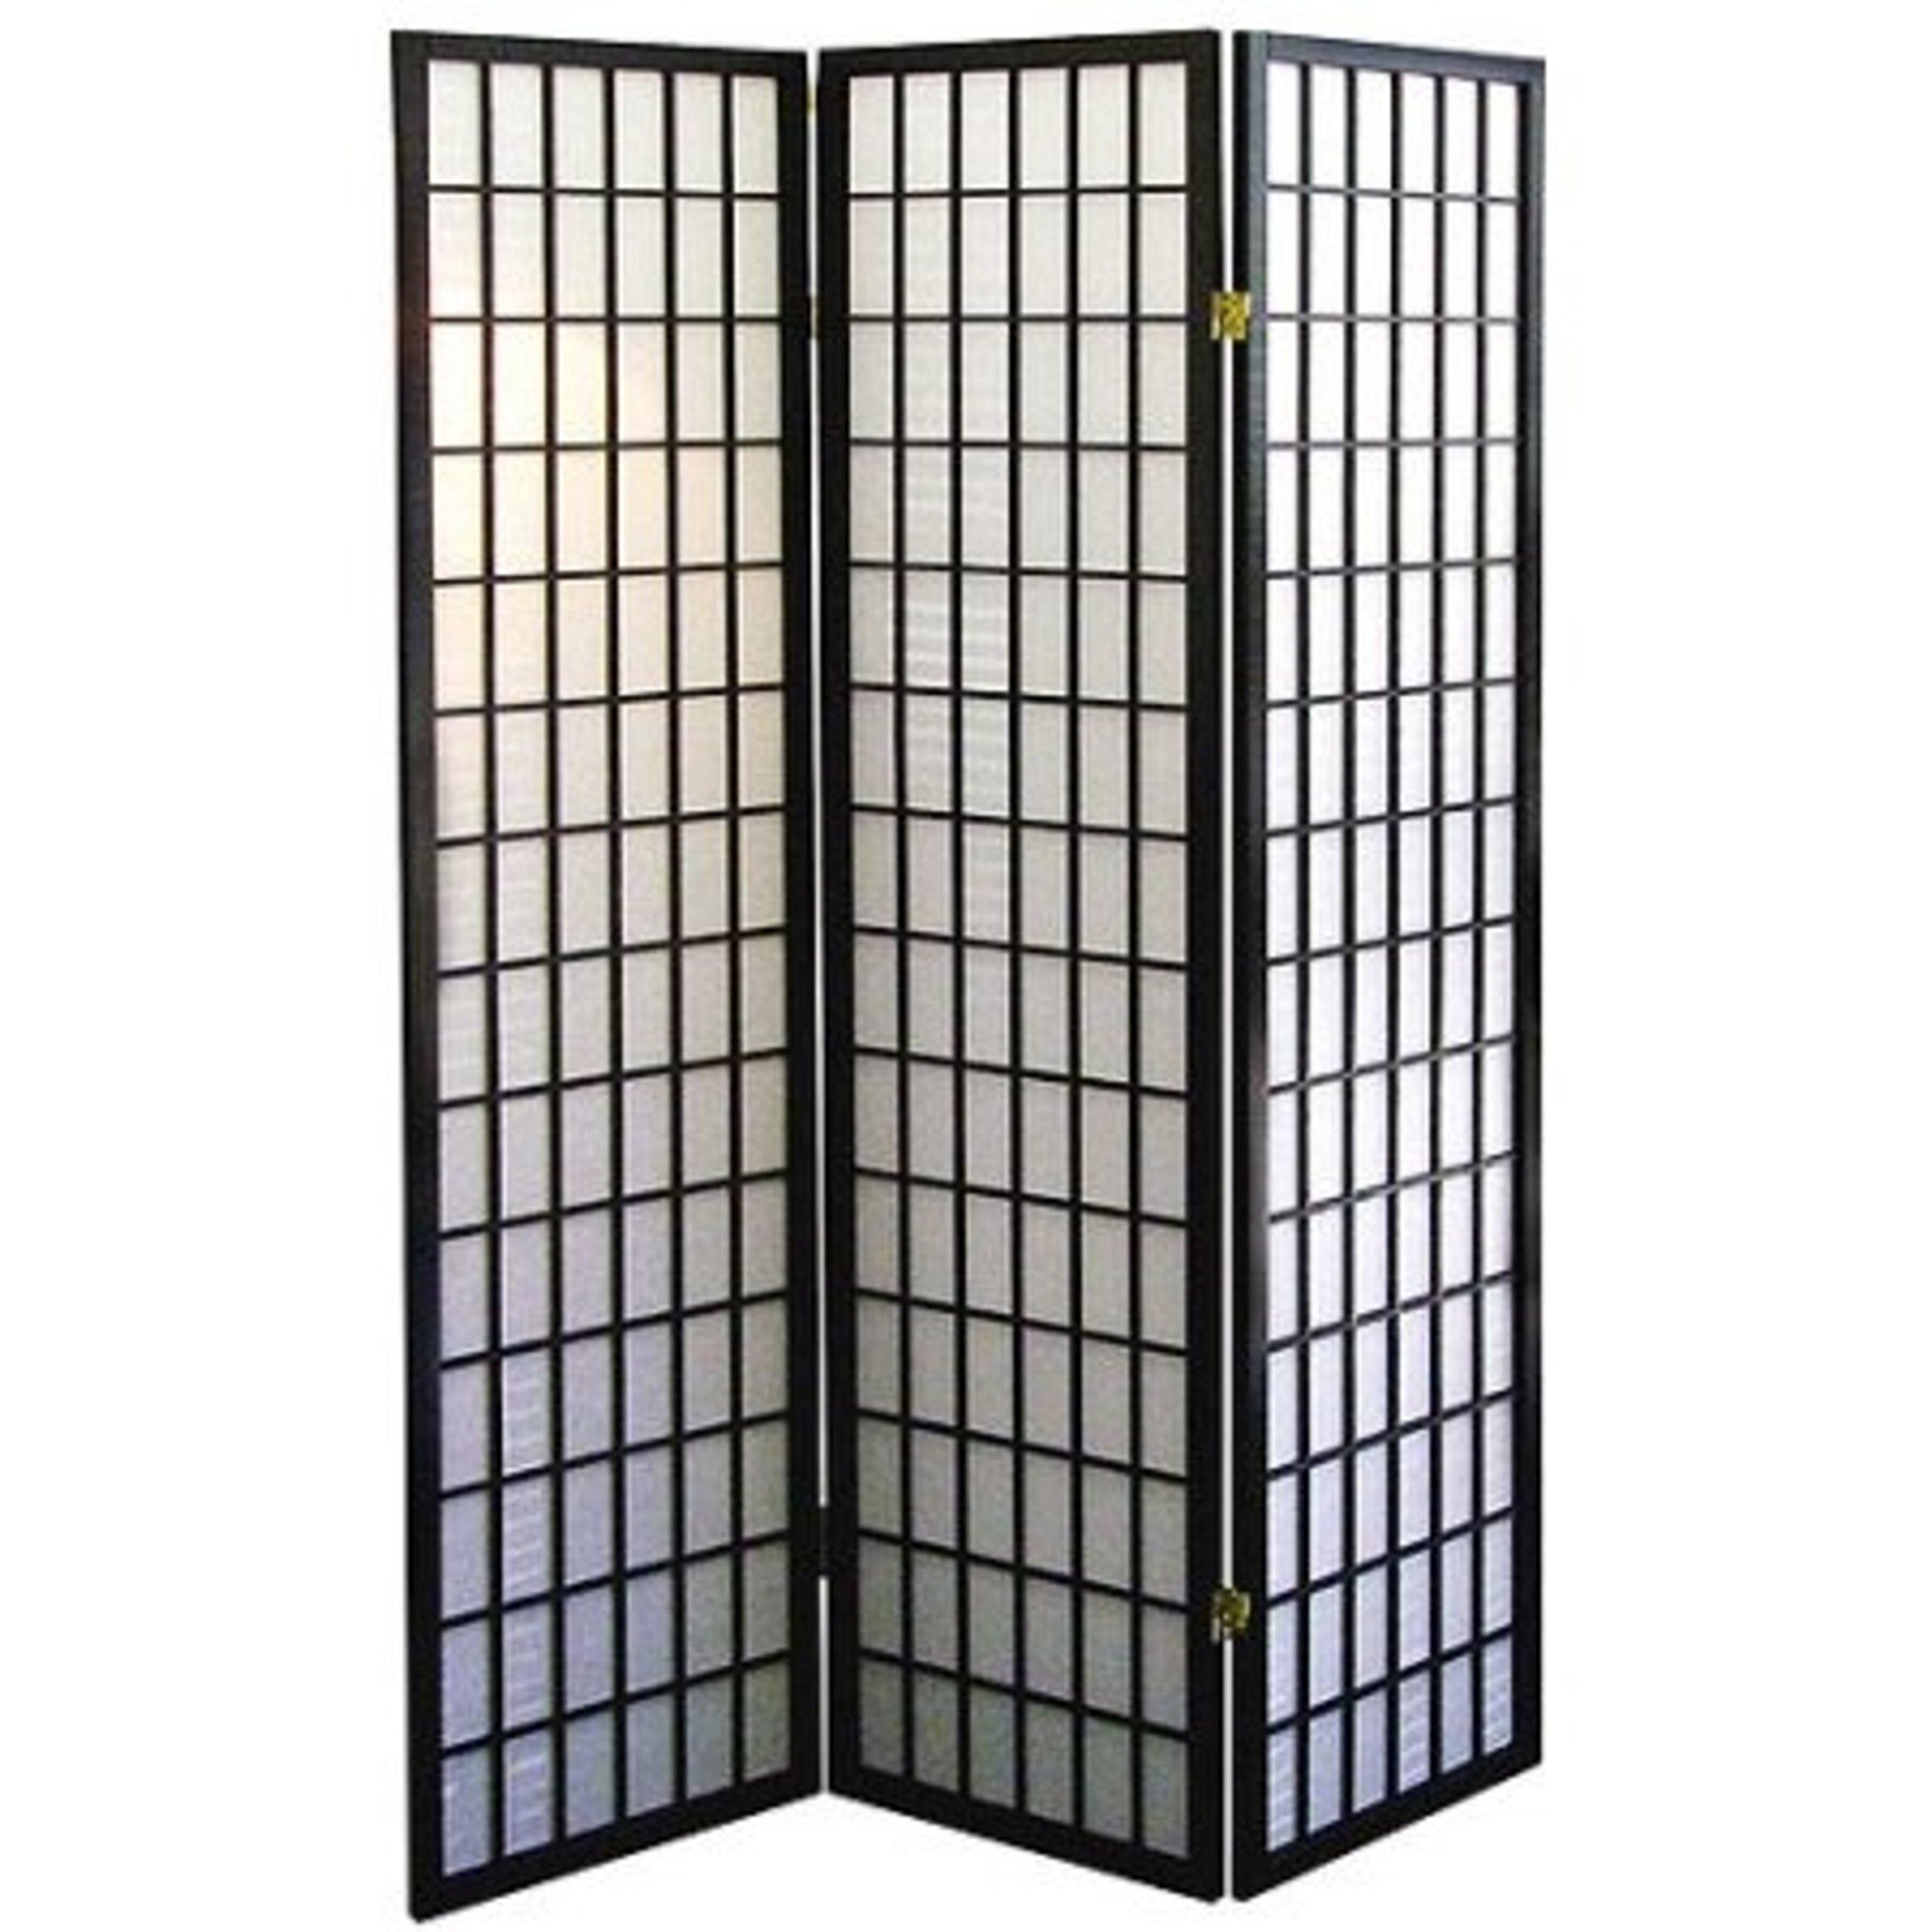 Black Asian Furniture Style Screen Room Decor 3-Panel Divider